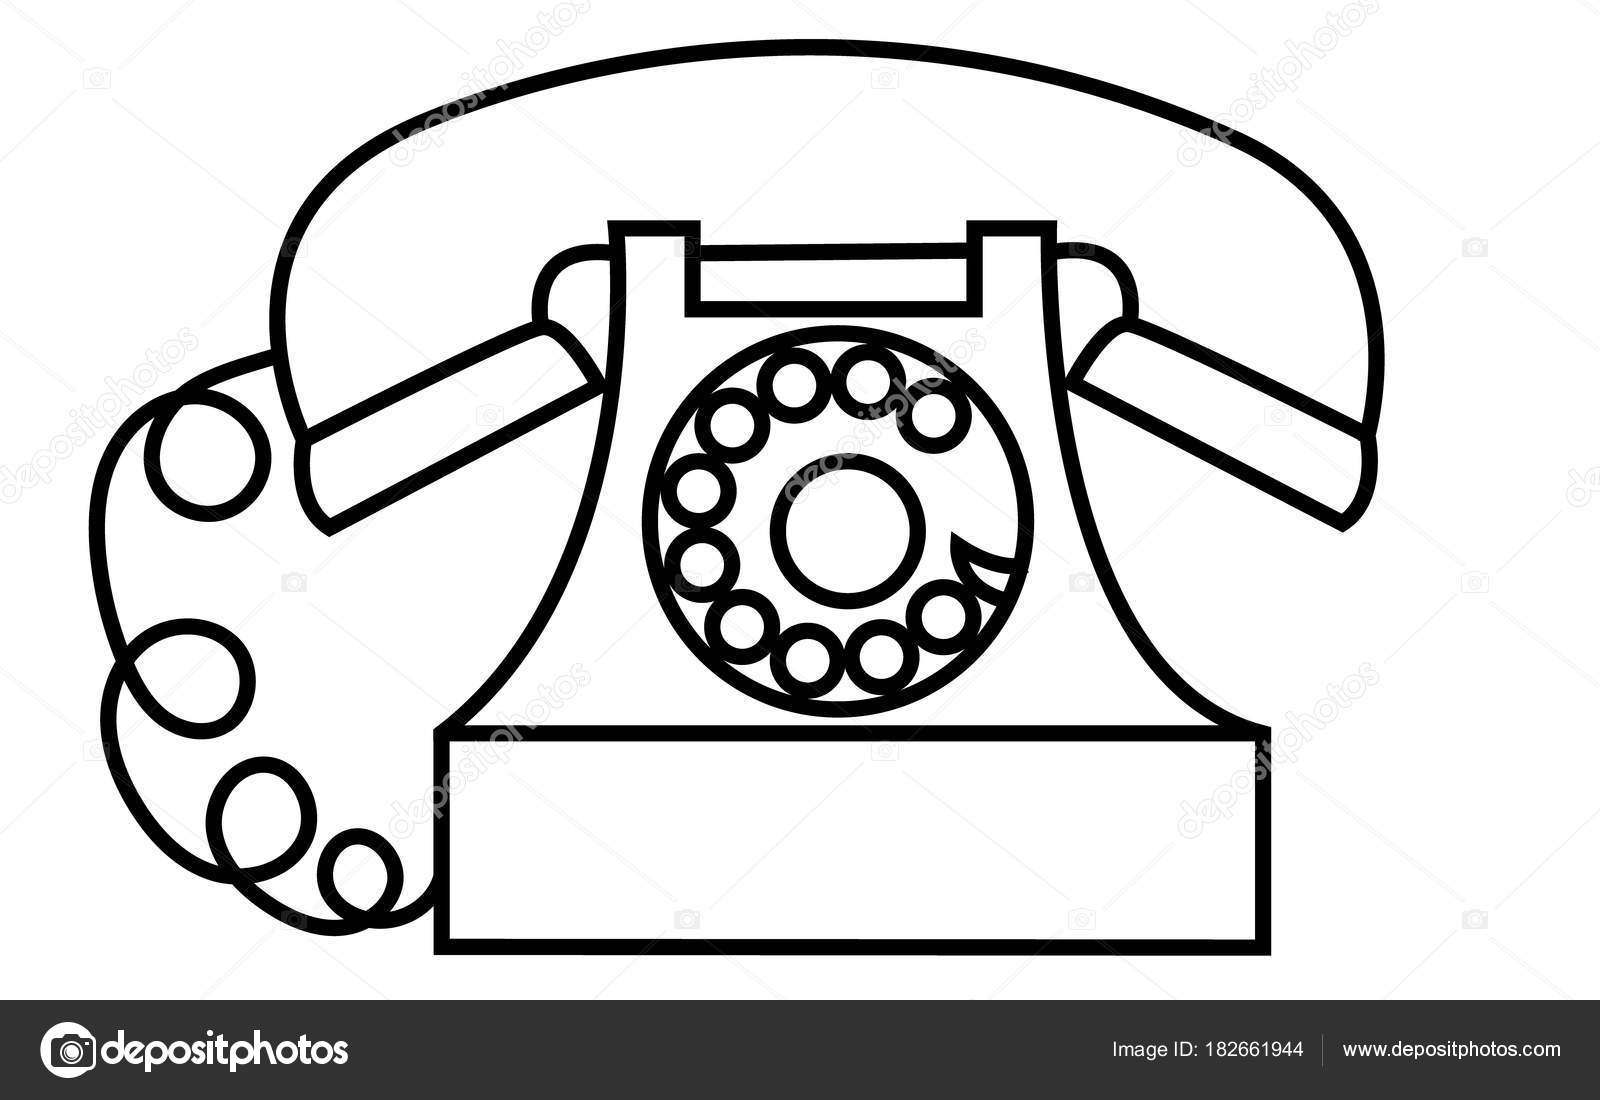 old fashioned telephone operator